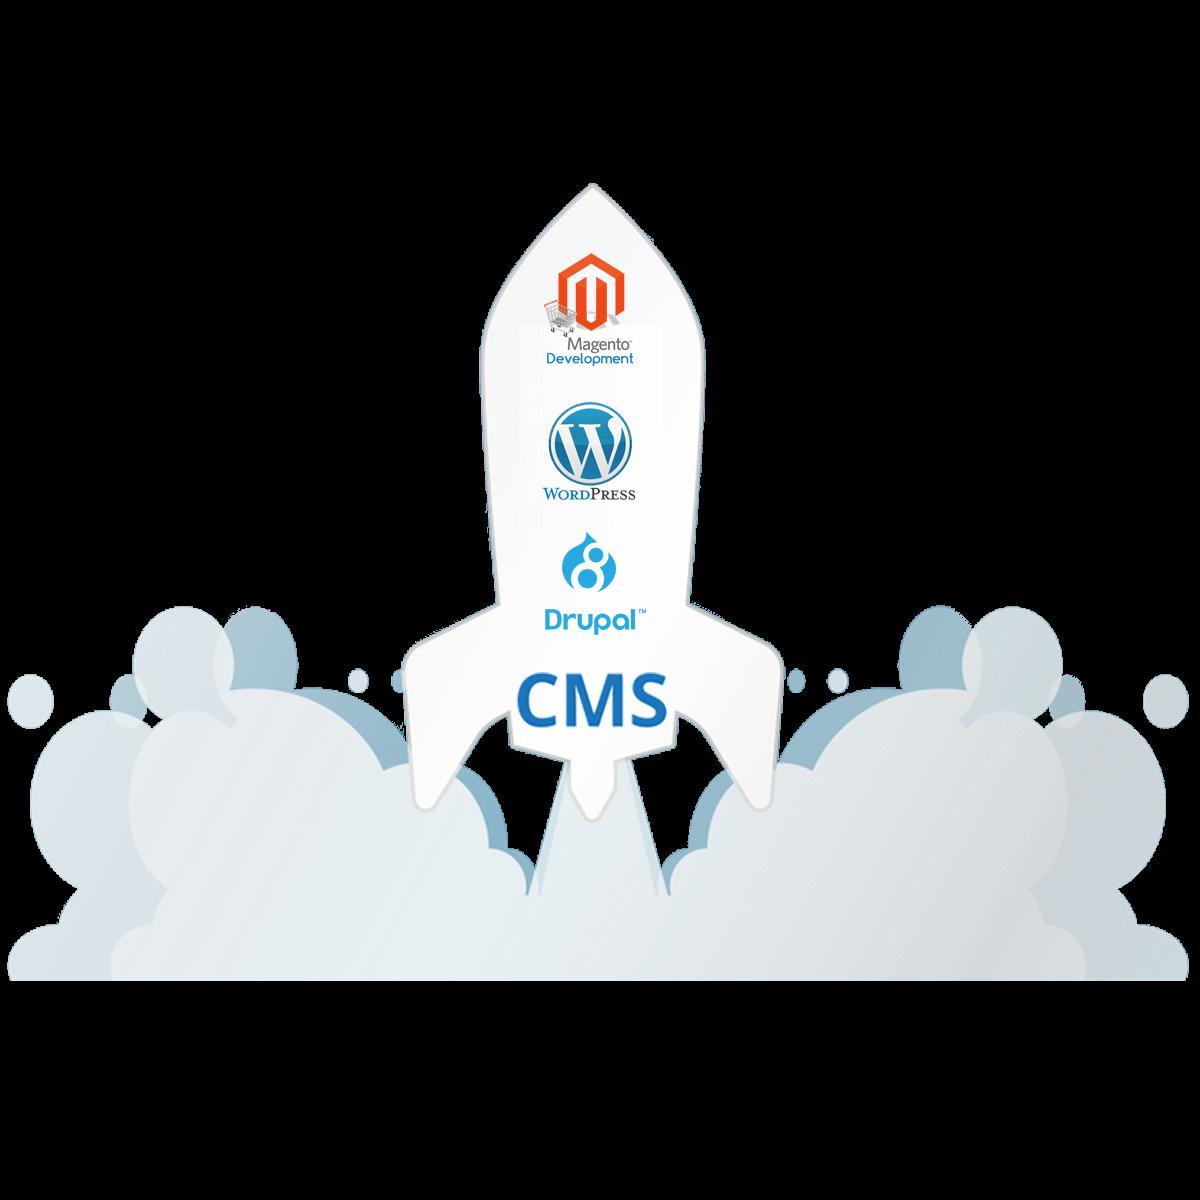 création de site web en wordpress